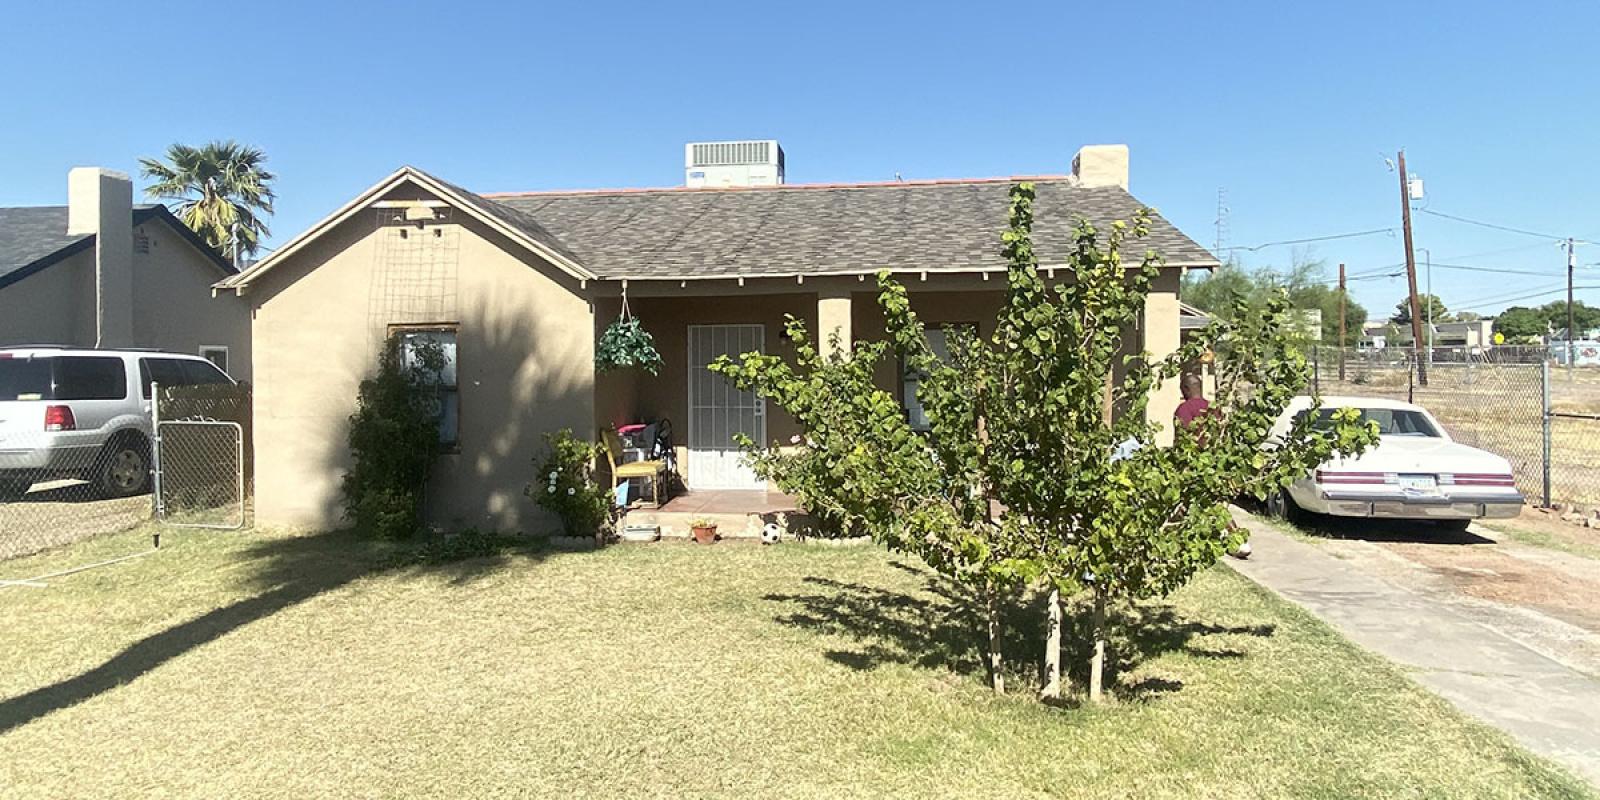 2930 E Monroe St, Phoenix, Arizona 85034, 2 Bedrooms Bedrooms, ,1 BathroomBathrooms,SFR,Pending,E Monroe St,1224